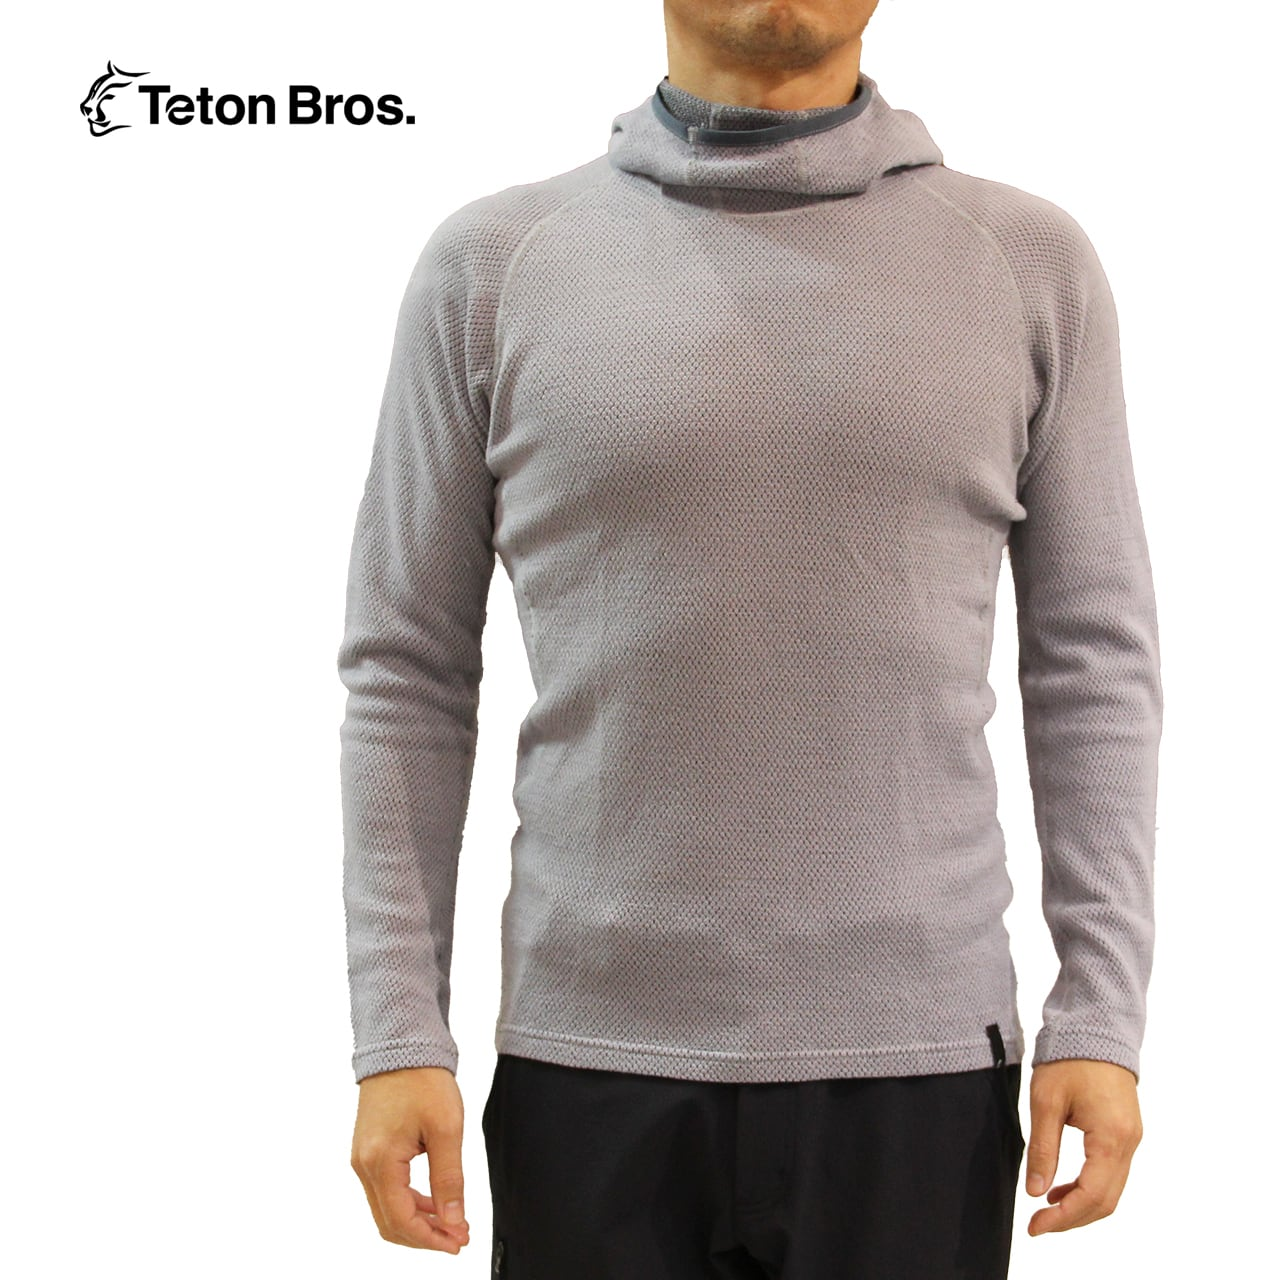 Teton Bros. MOB WOOL HOODY